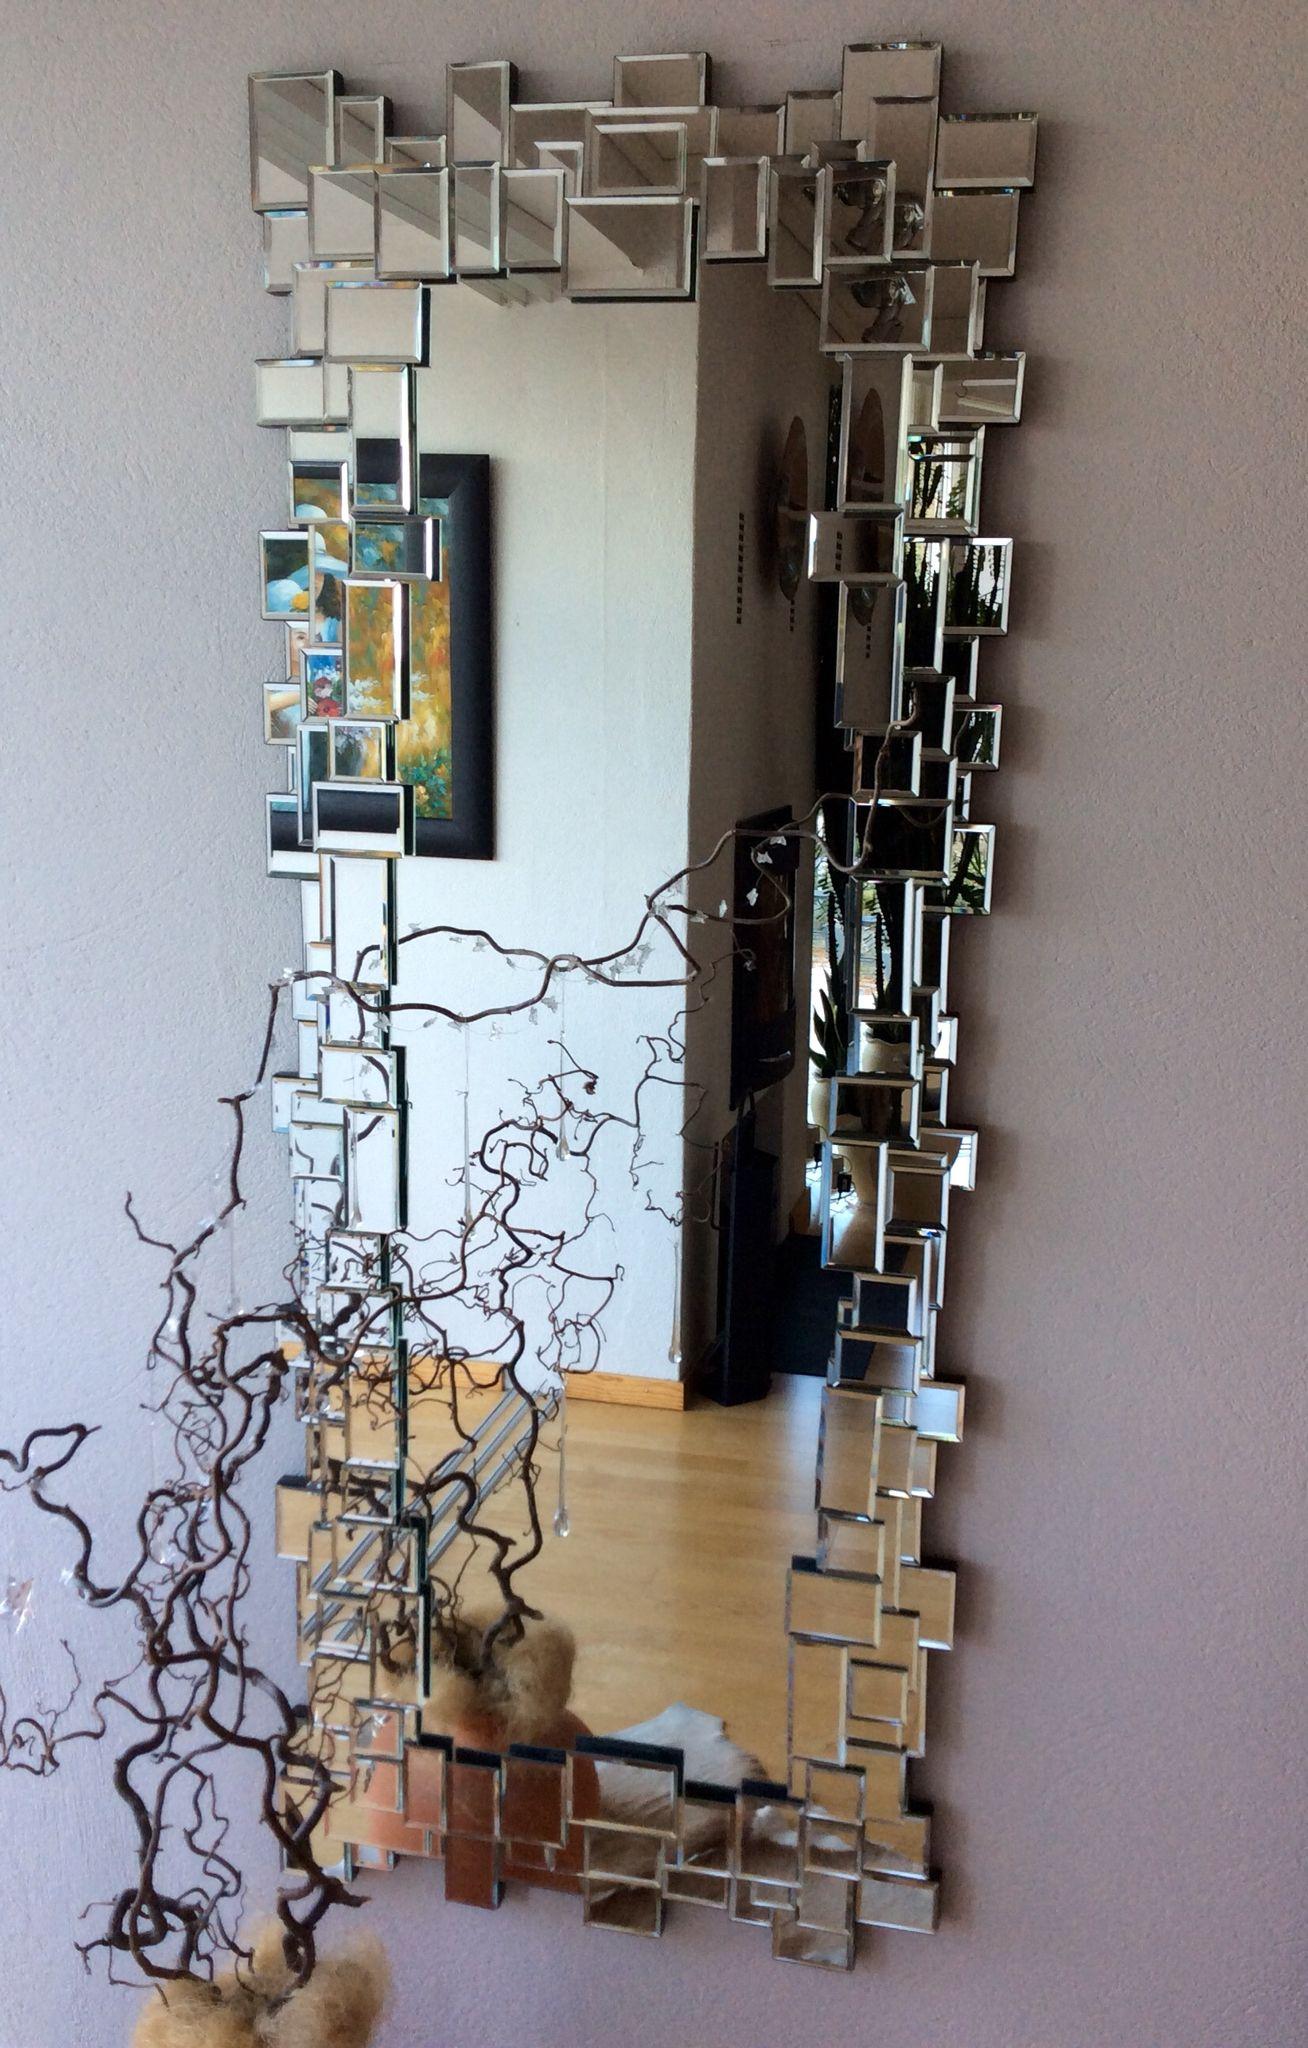 5e1010b9 ... #klassisk #glass #interior #interiør #interiormirame #interiørmirame  #design #stue #gang #dekor #interiørpånett #nettbutikk  #mirameinteriørogdesign